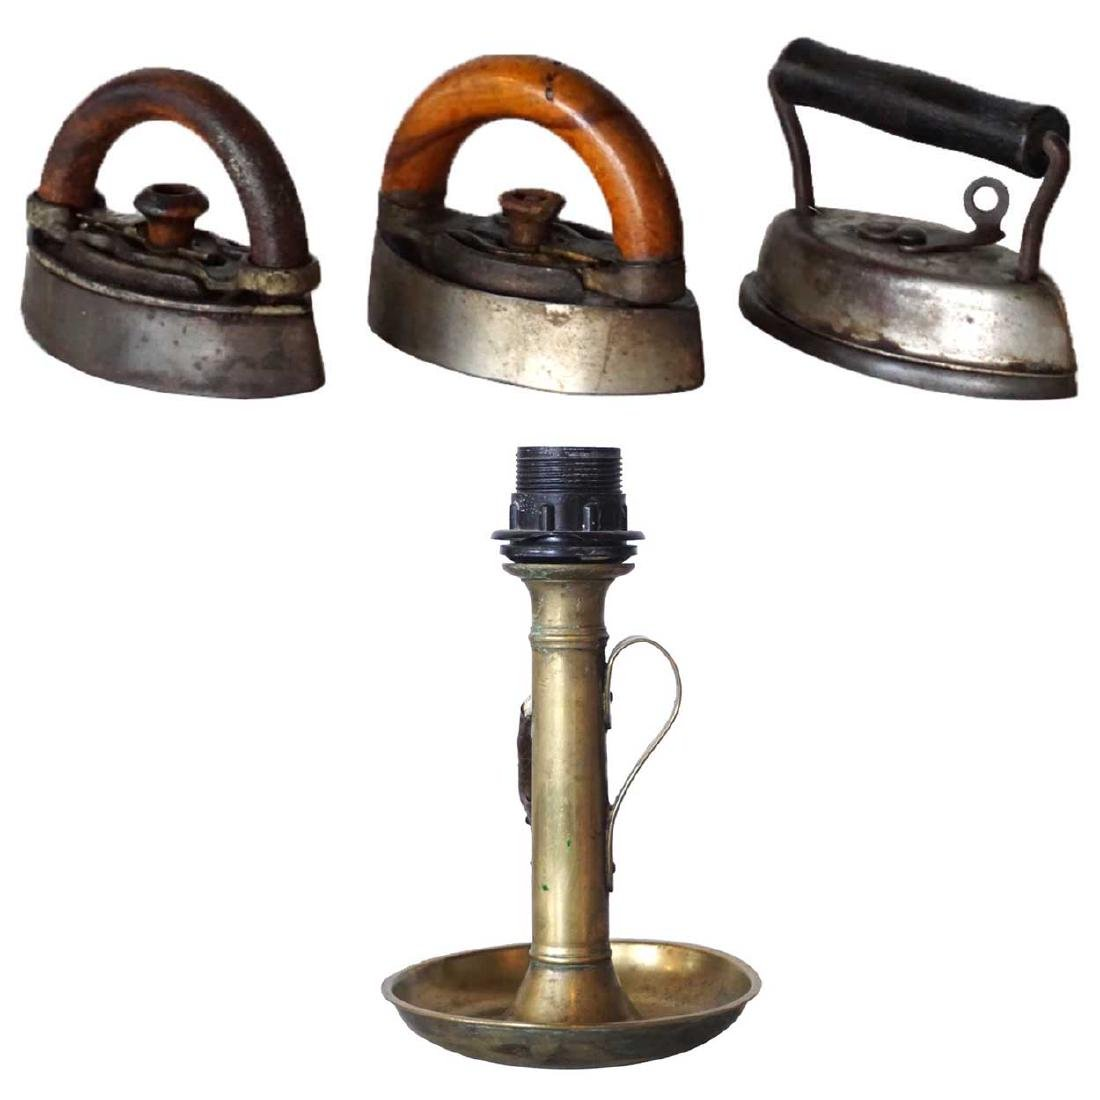 Antique Brass Candlestick Lamp & 3 Clothes Irons